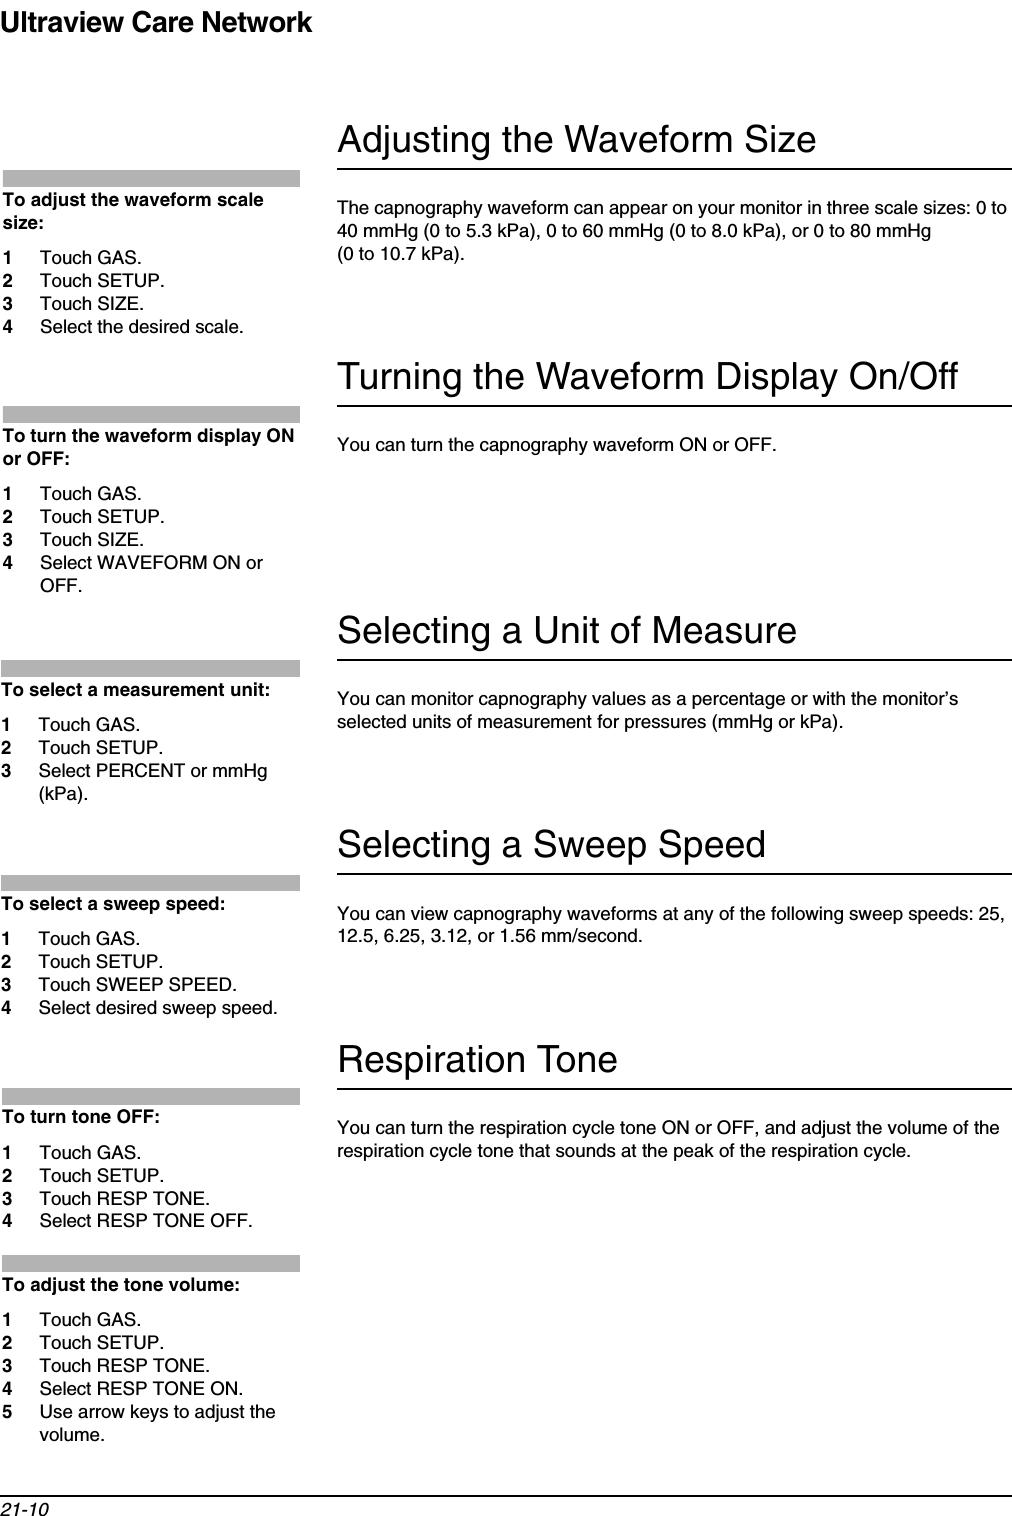 Capnography Waveform Cheat Sheet